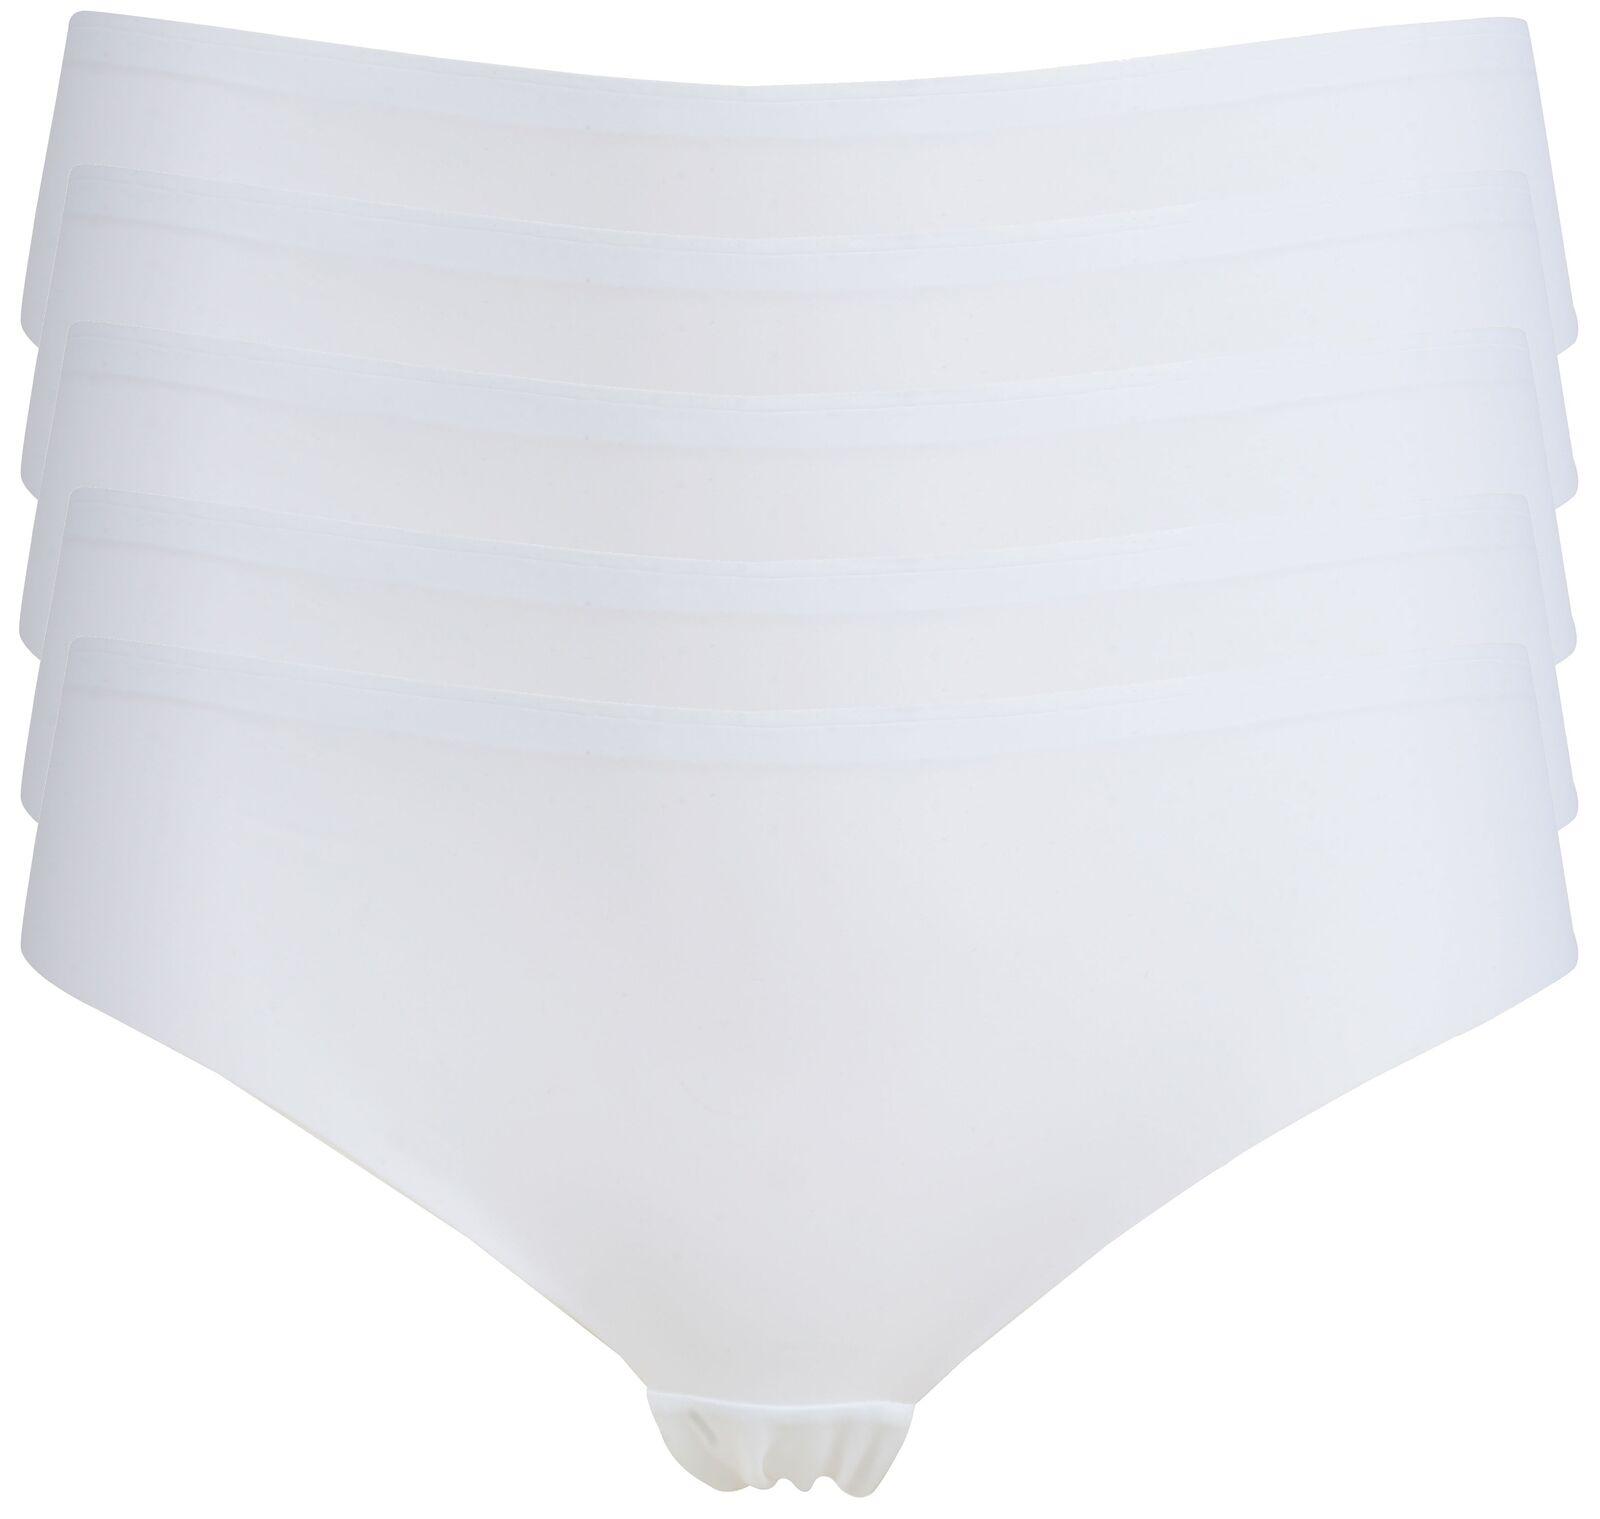 Ex Store Multipack No VPL Bonded Lace Back Brazilian Knickers